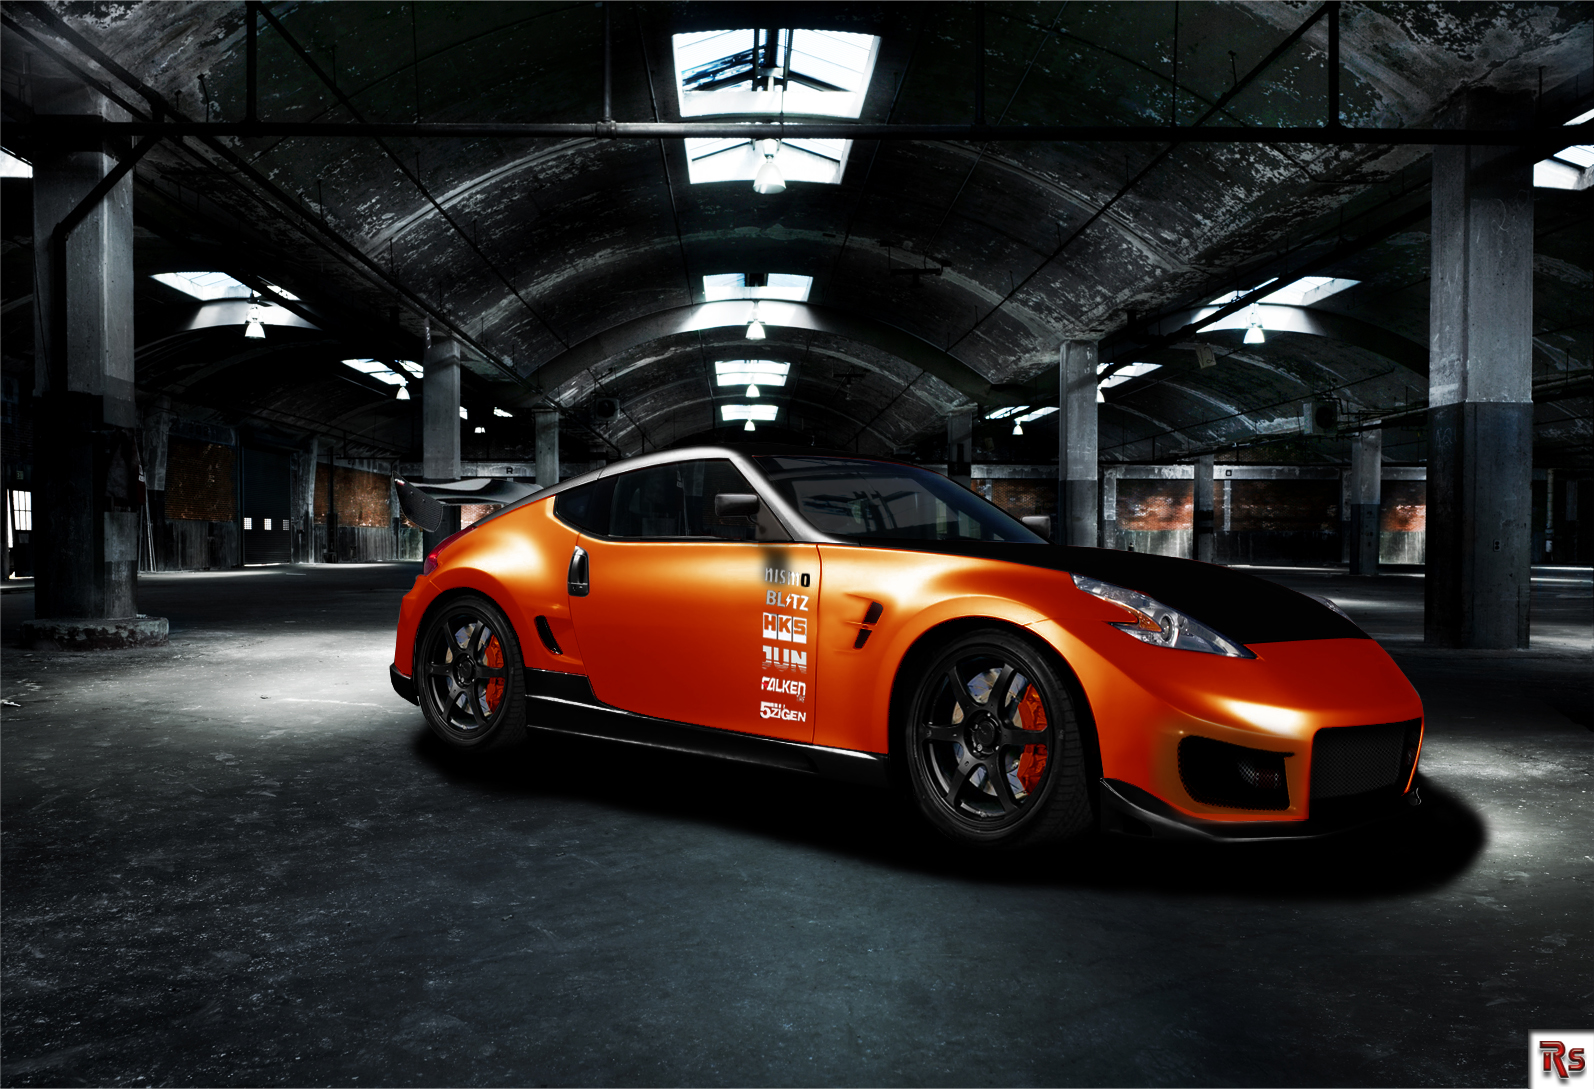 370z Nismo Wallpaper Tuned nismo 370z   orange by 1594x1089